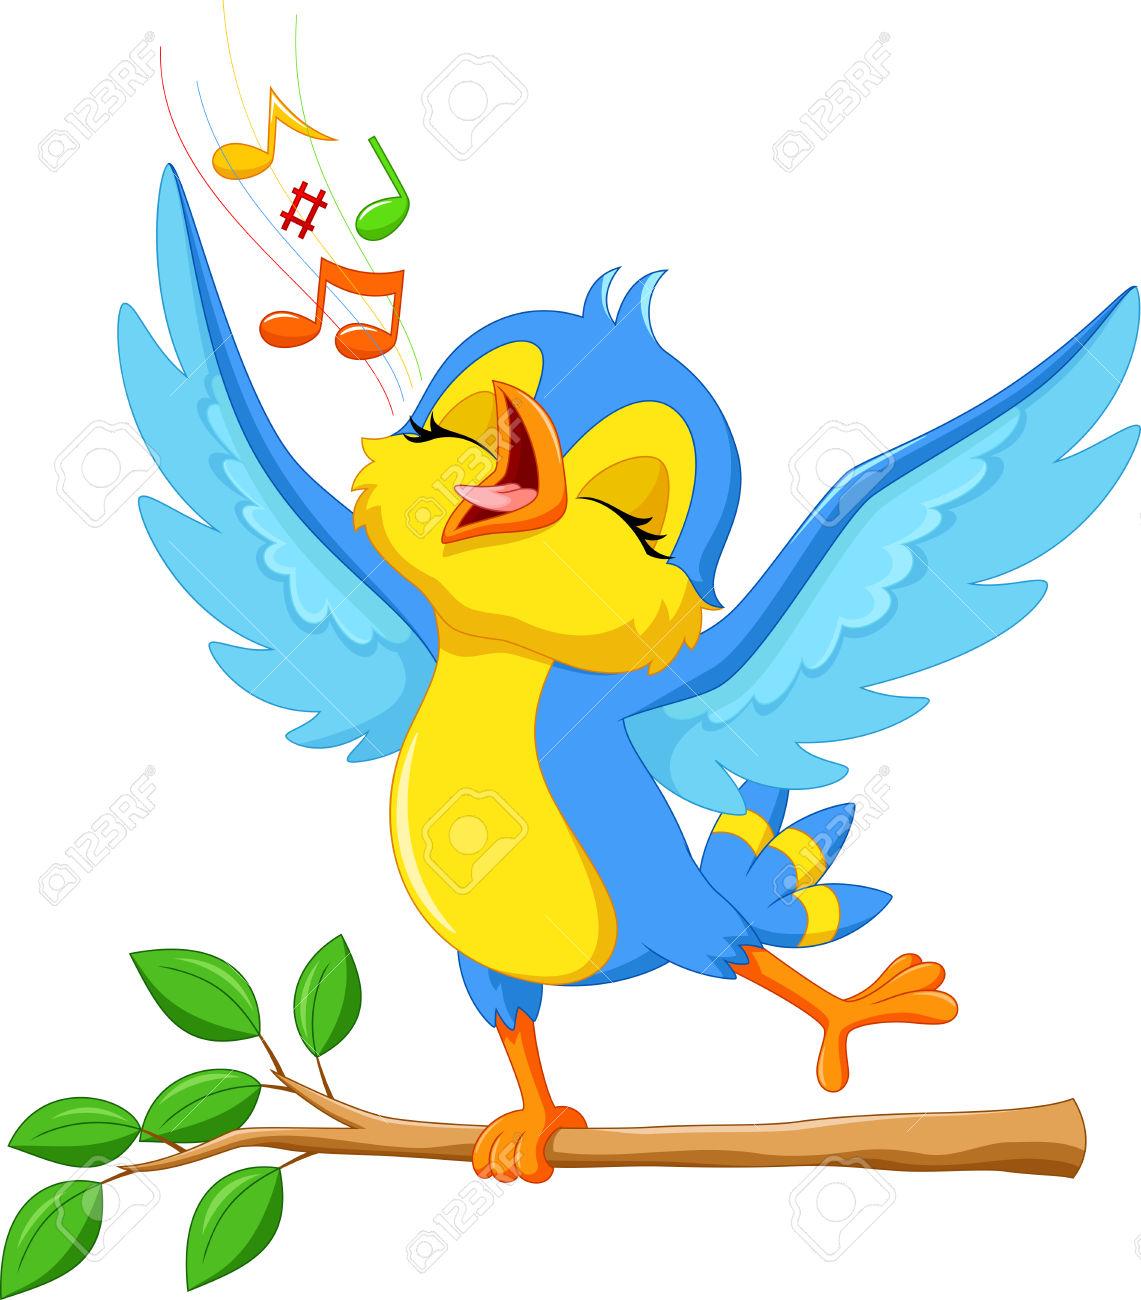 378,218 Bird Stock Vector Illustration And Royalty Free Bird Clipart.